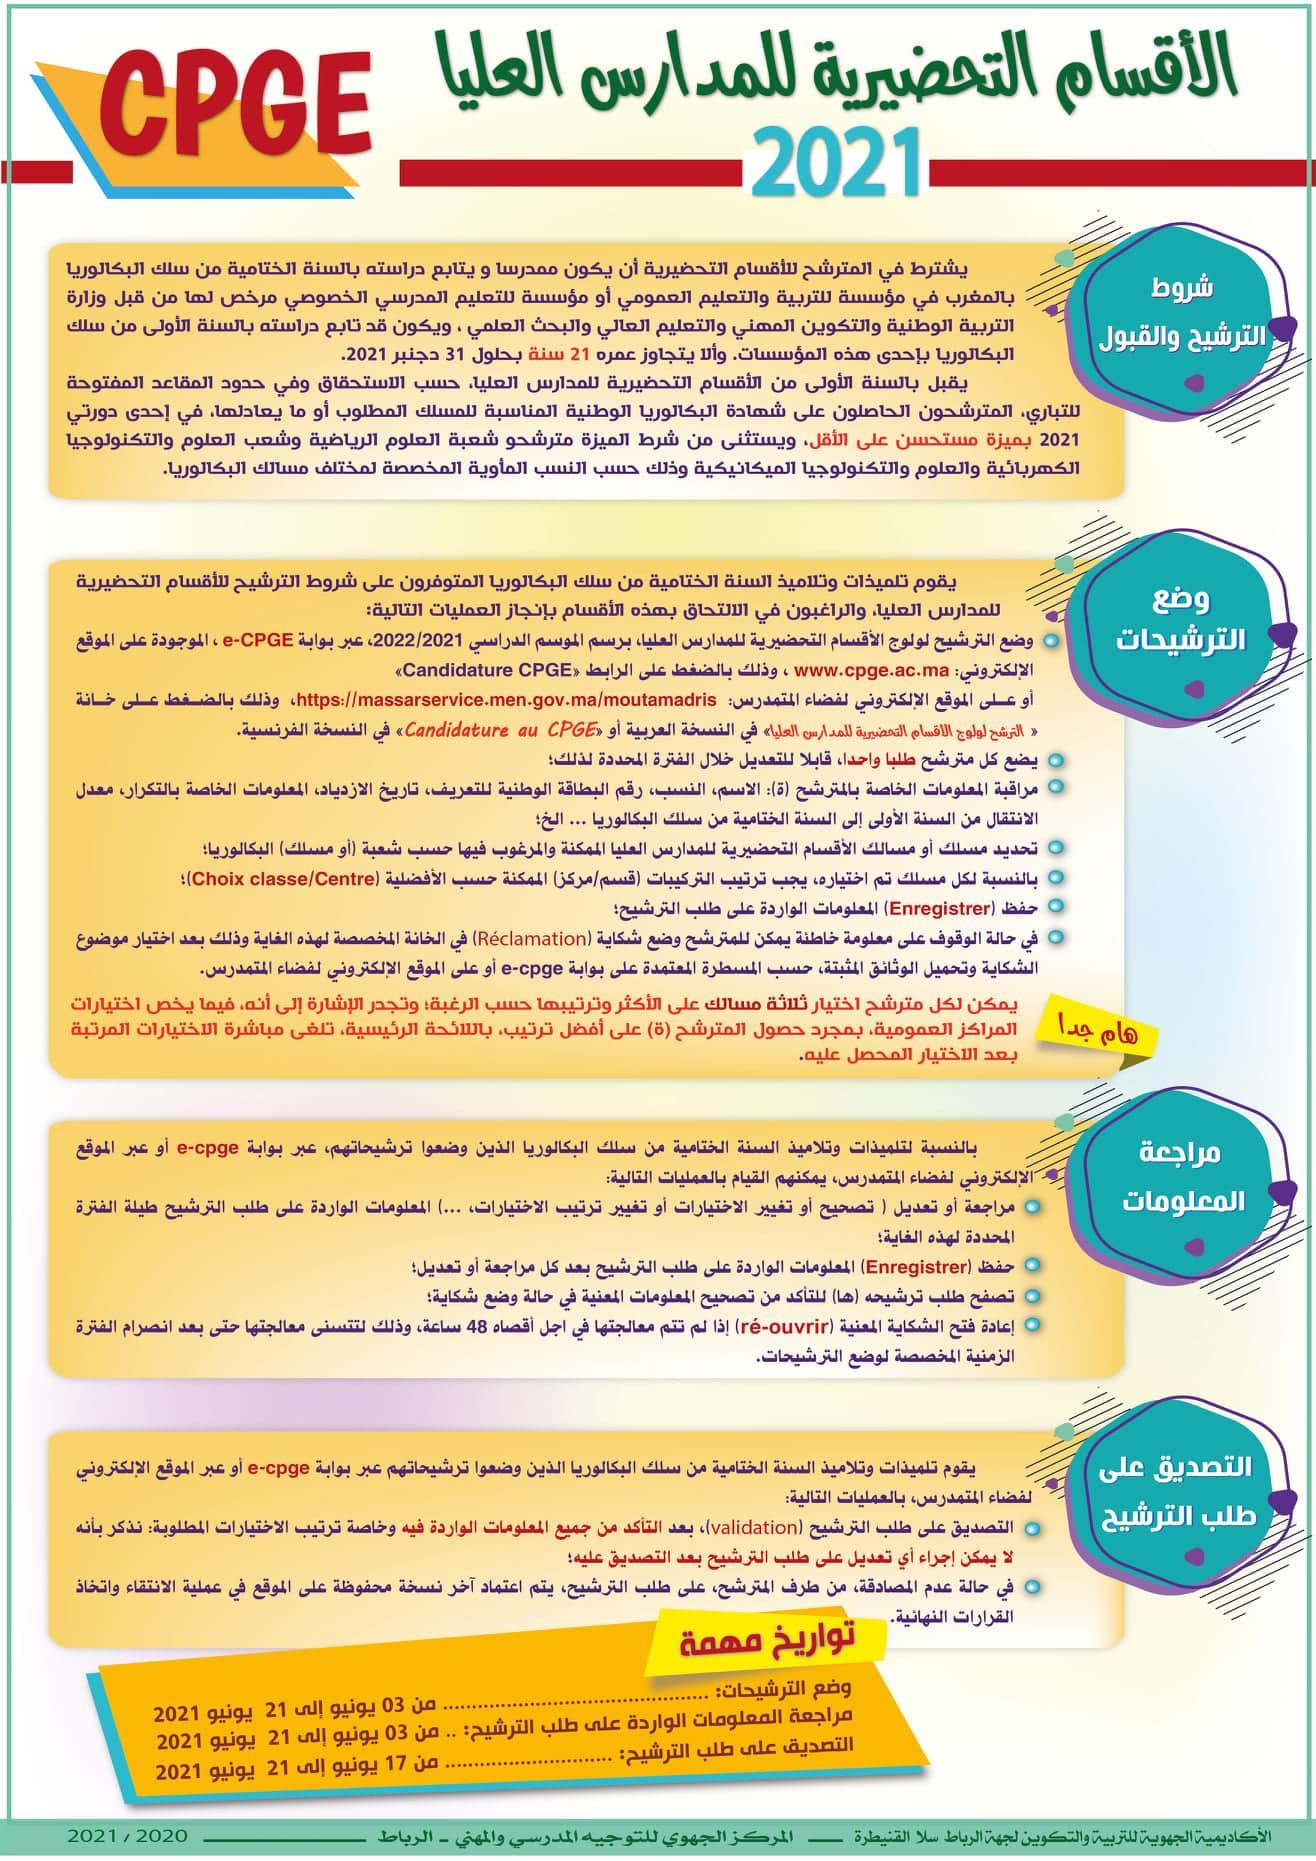 inscription concours CPGE Résultats CPGE 2021/2022 نتائج الأقسام التحضيرية للمدارس العليا